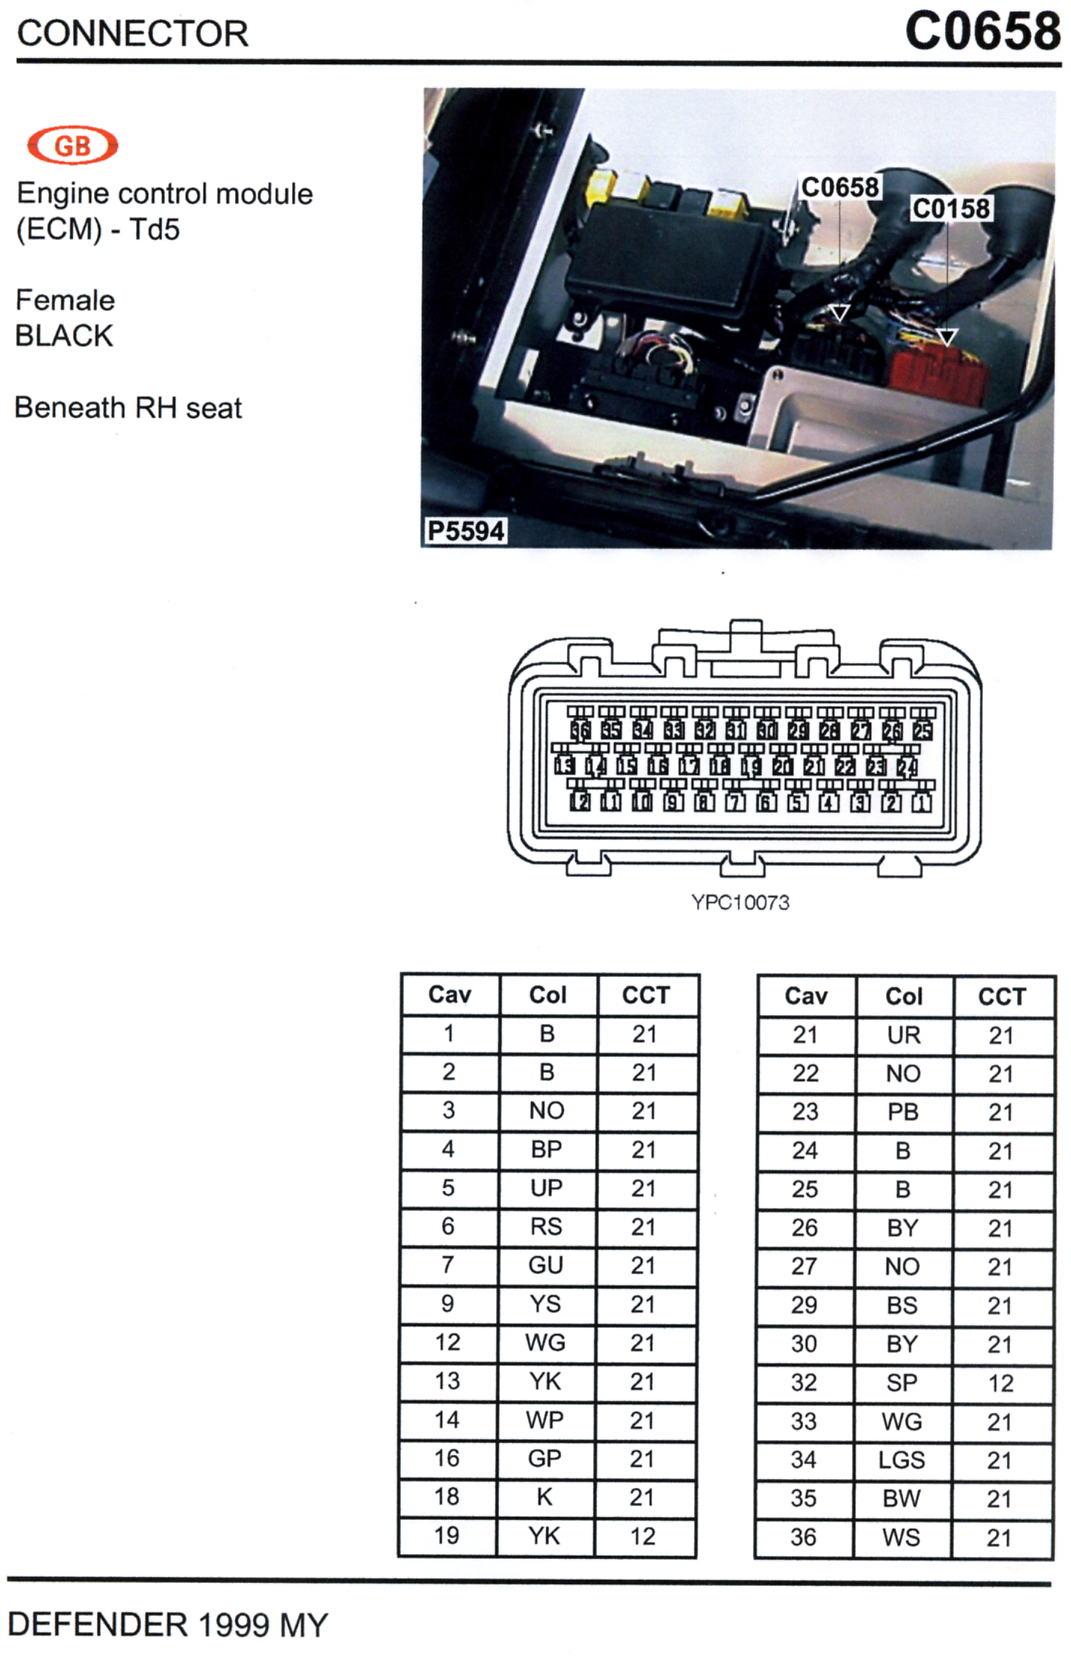 Land Rover Discovery Ecu Diagram Electrical Wiring Defender Fuse Box Layout Td5 U2022 Lr4